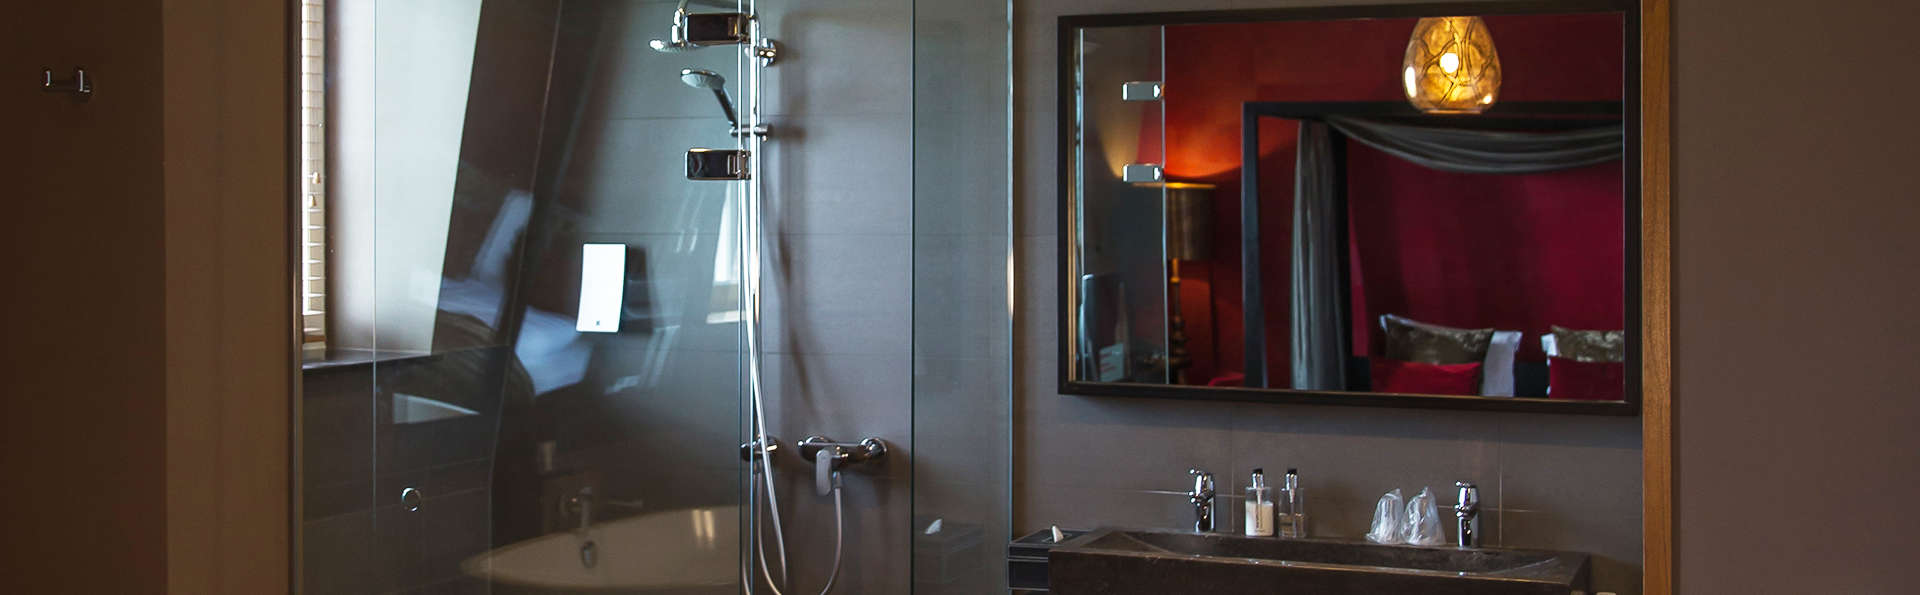 Grand Hotel Merici Sittard - edit_bruidSuite_bathroom.jpg